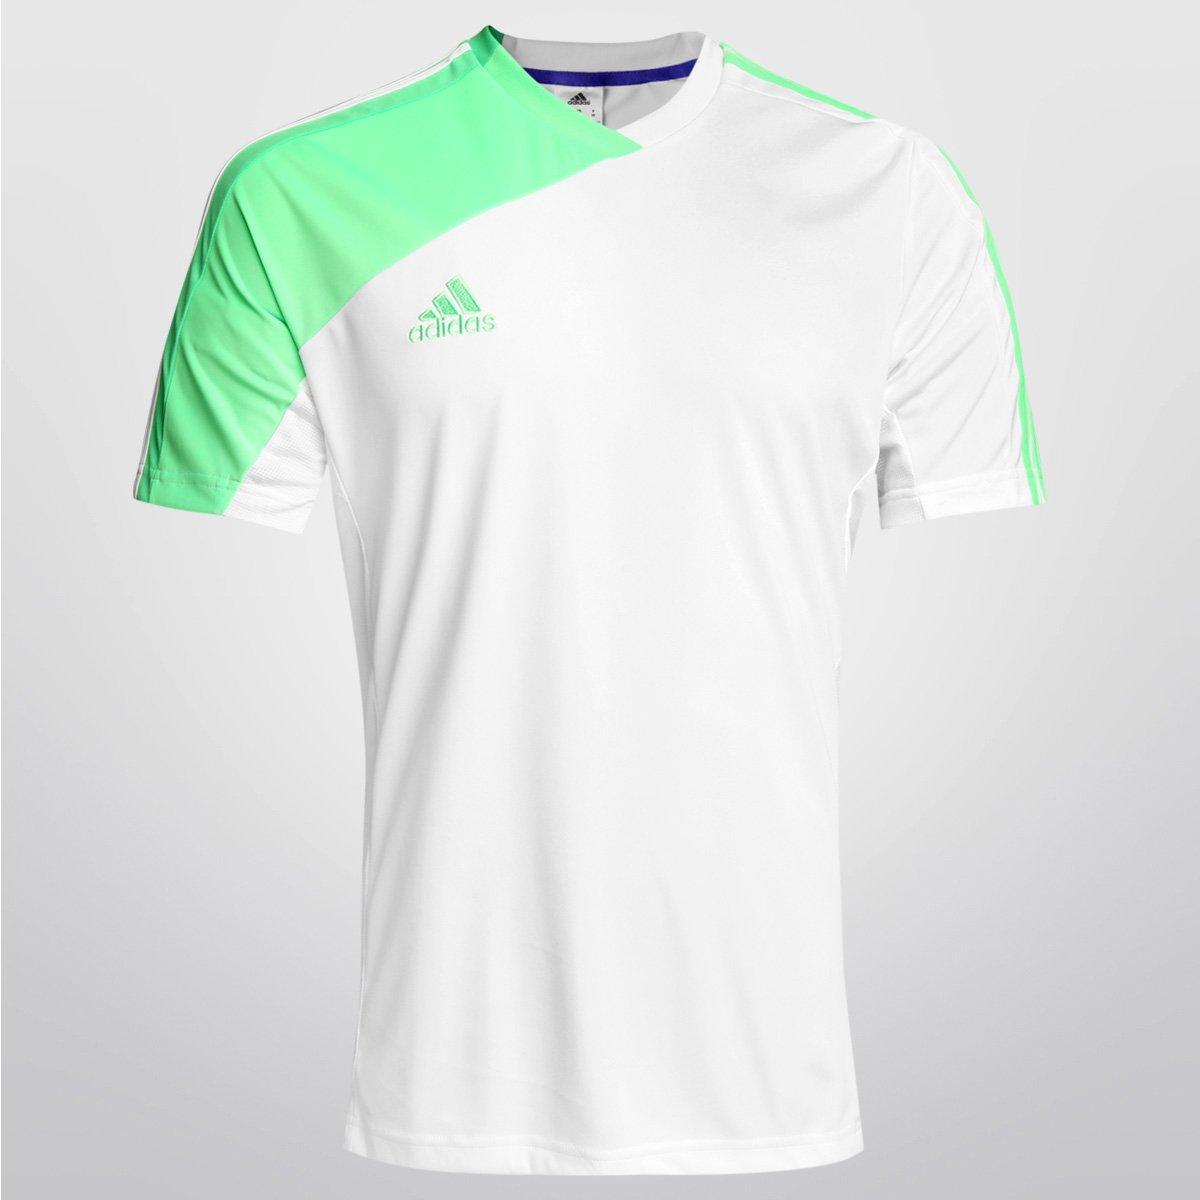 aaf05f55445 Camisa Adidas Bazzo 15 - Compre Agora